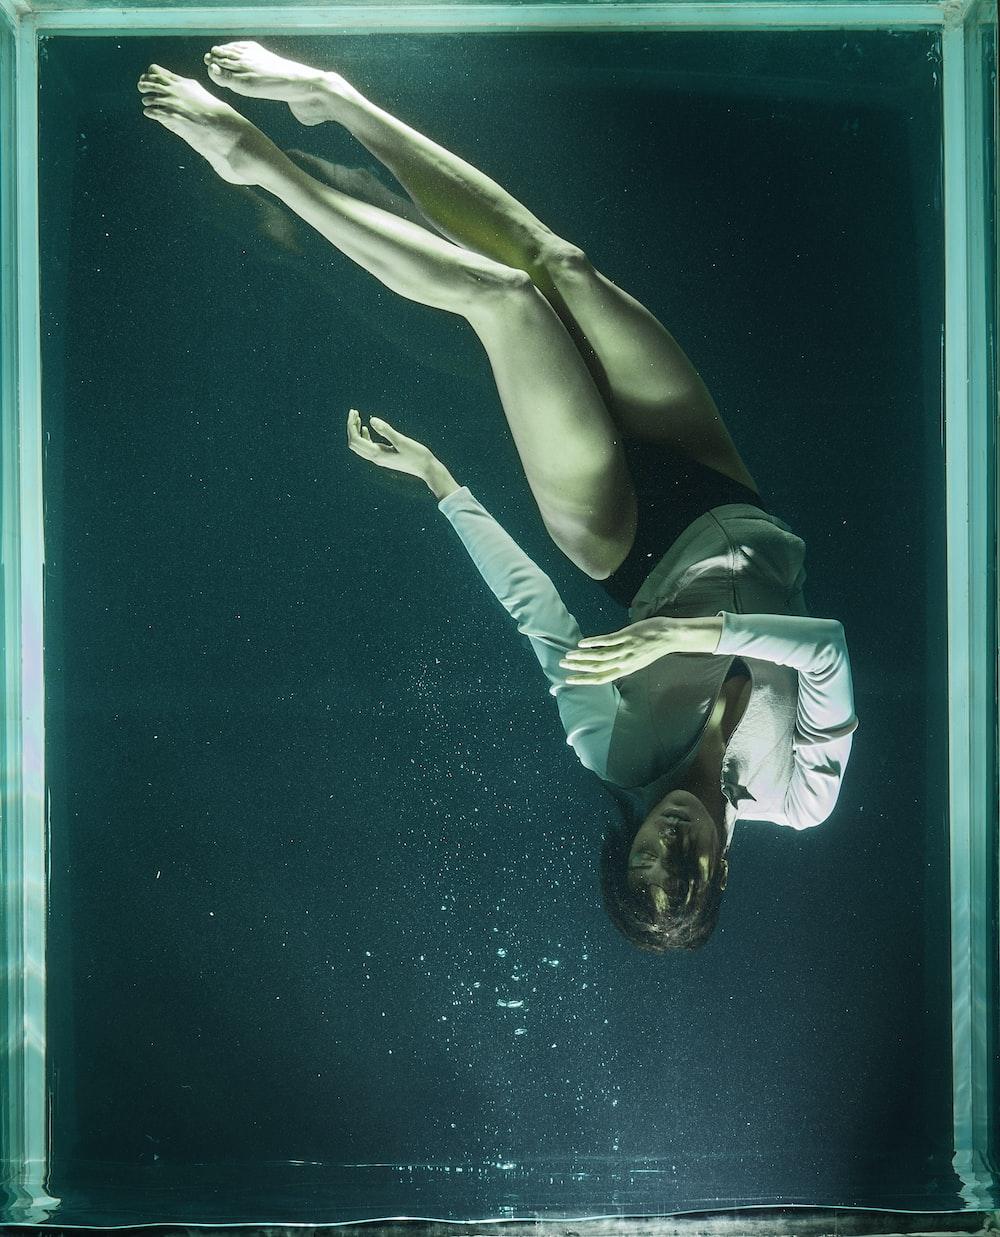 woman in white and black bikini lying on blue water